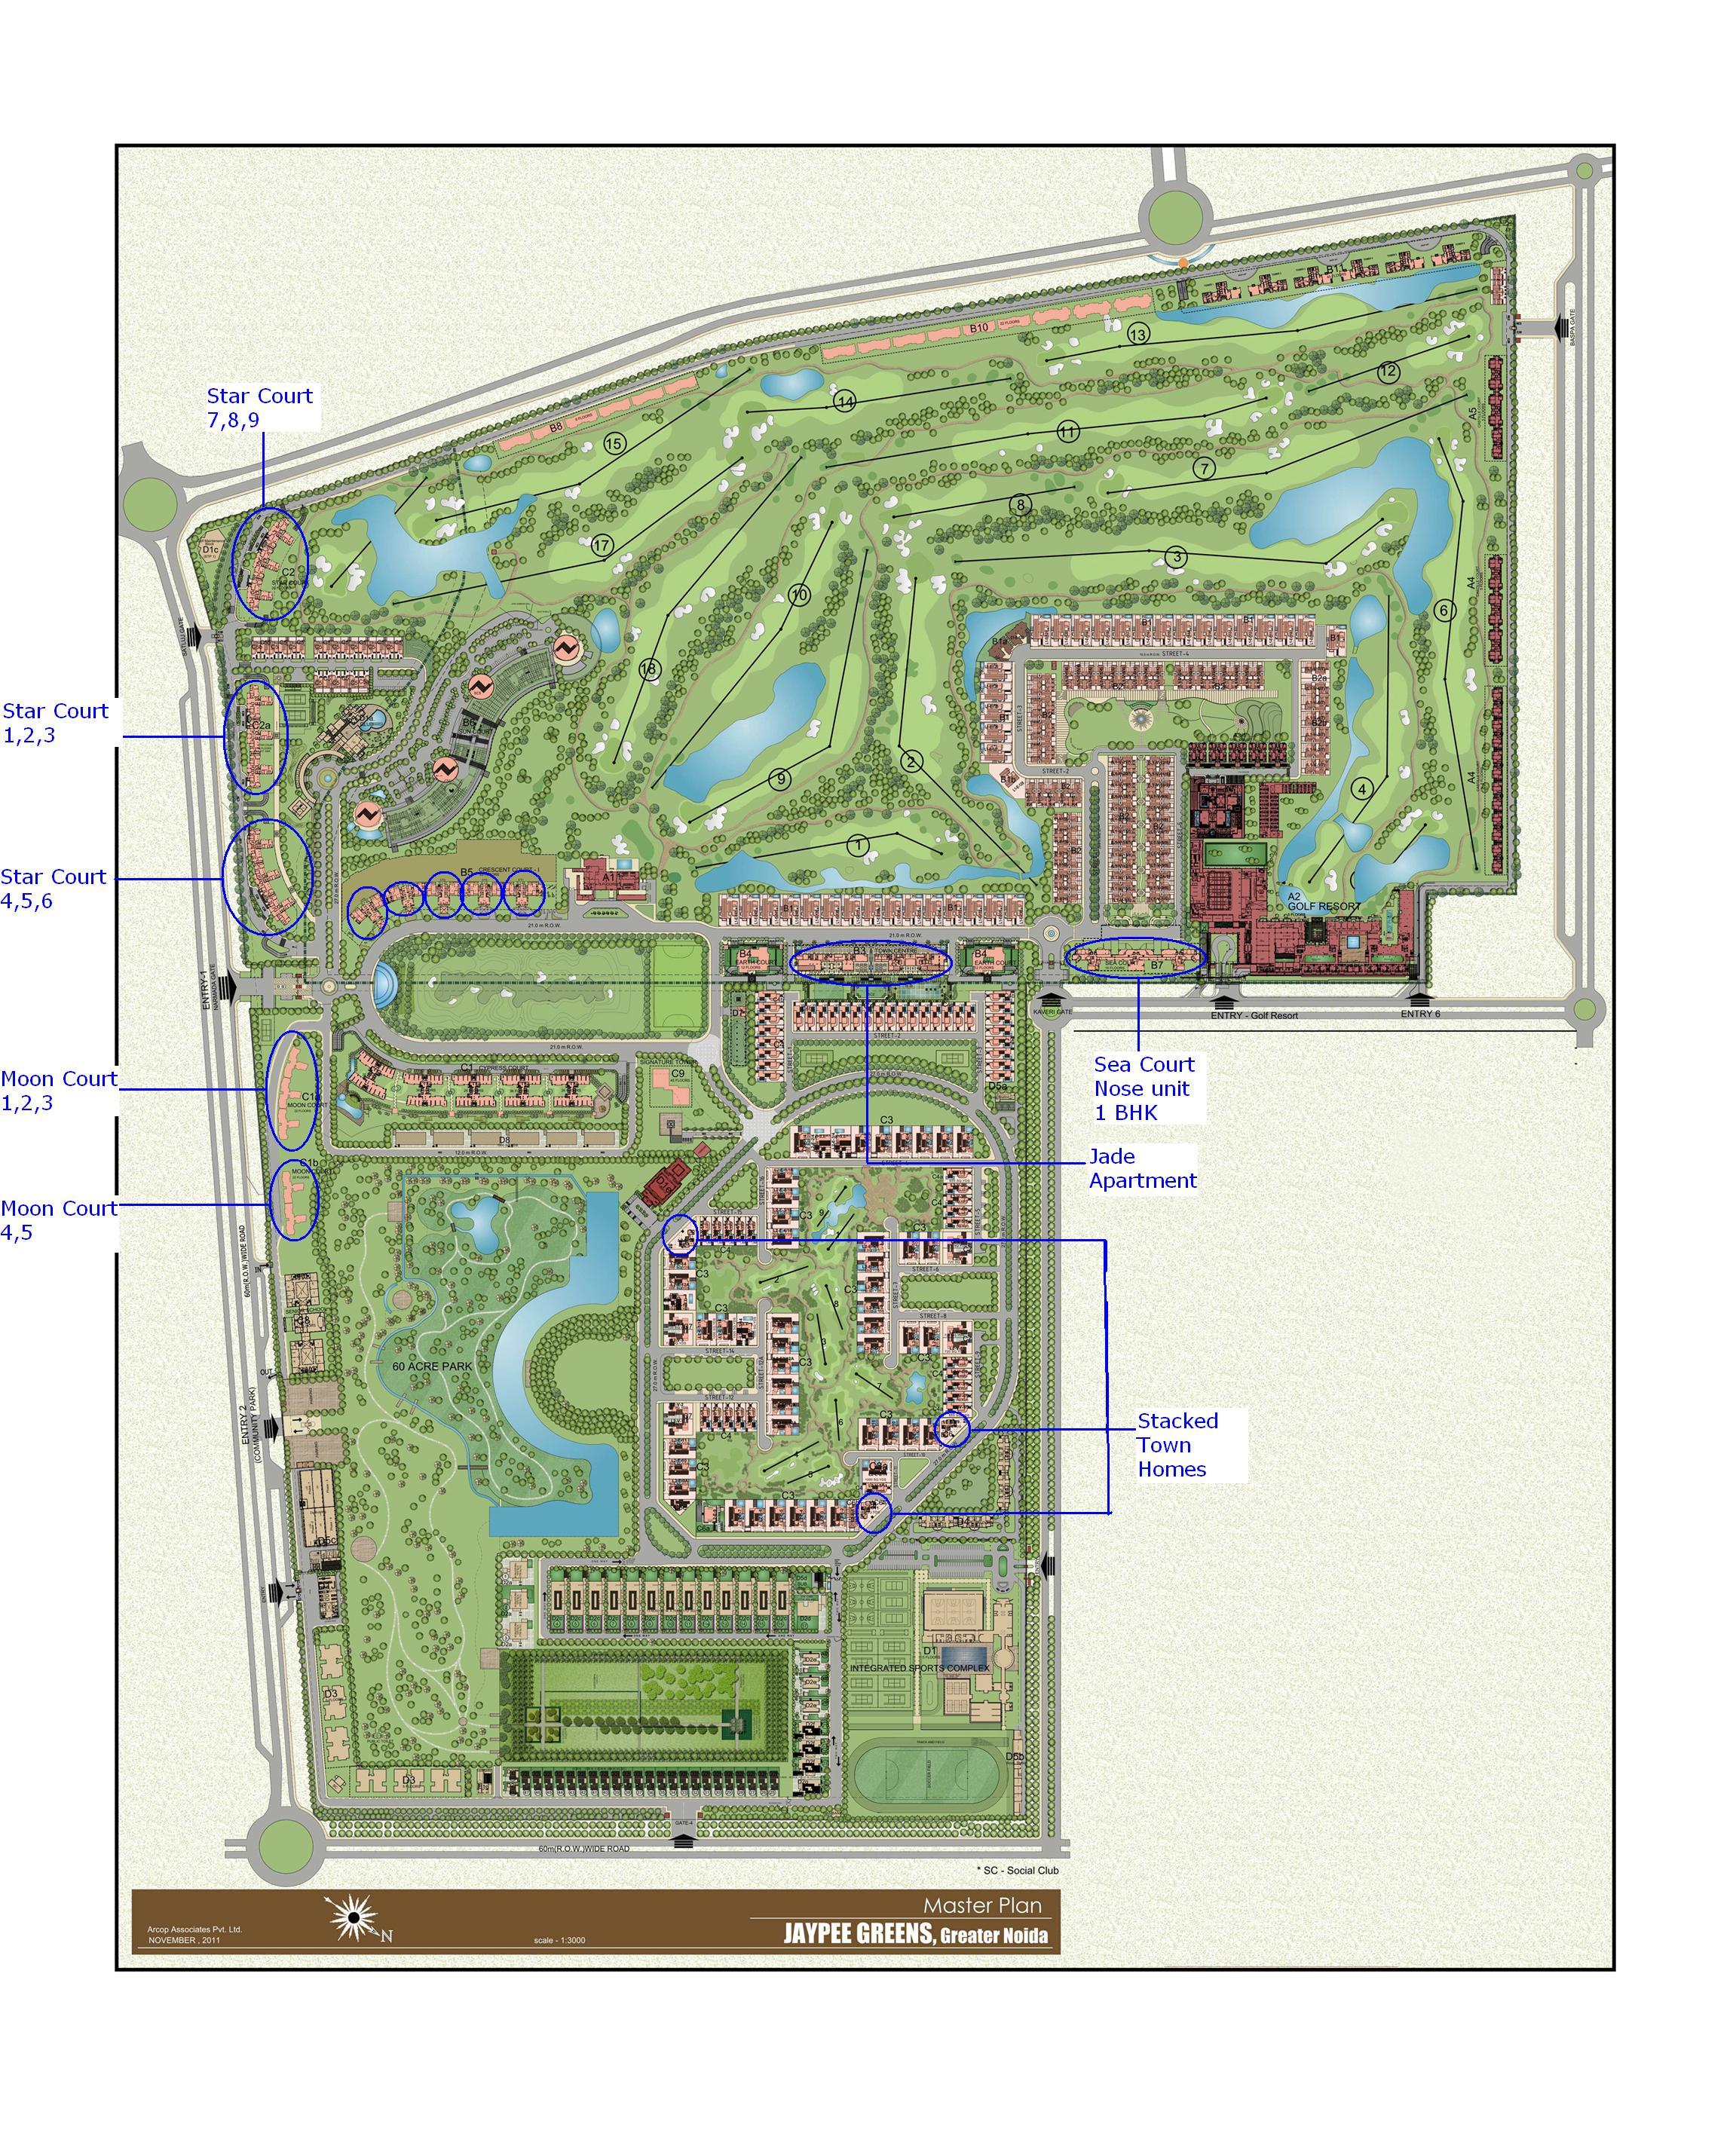 Jaypee Greens Greater Noida Master Plan